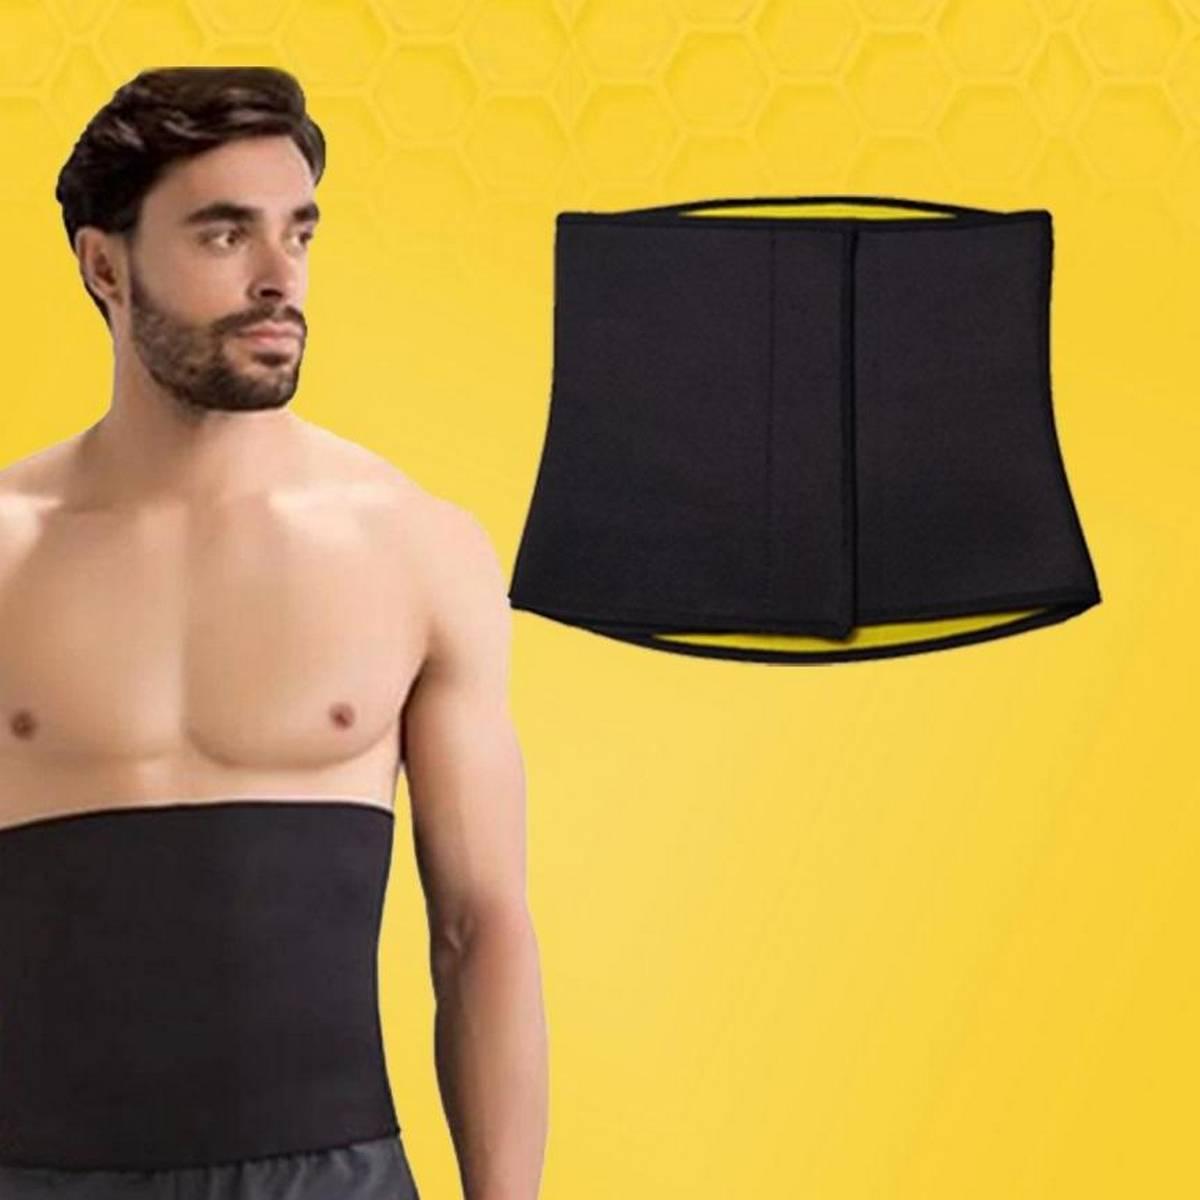 Hot Shapper Fat Burner, Weight Loss, Slimming Belt, Waist Shapper for Both Men & Women Product By Bravo Store